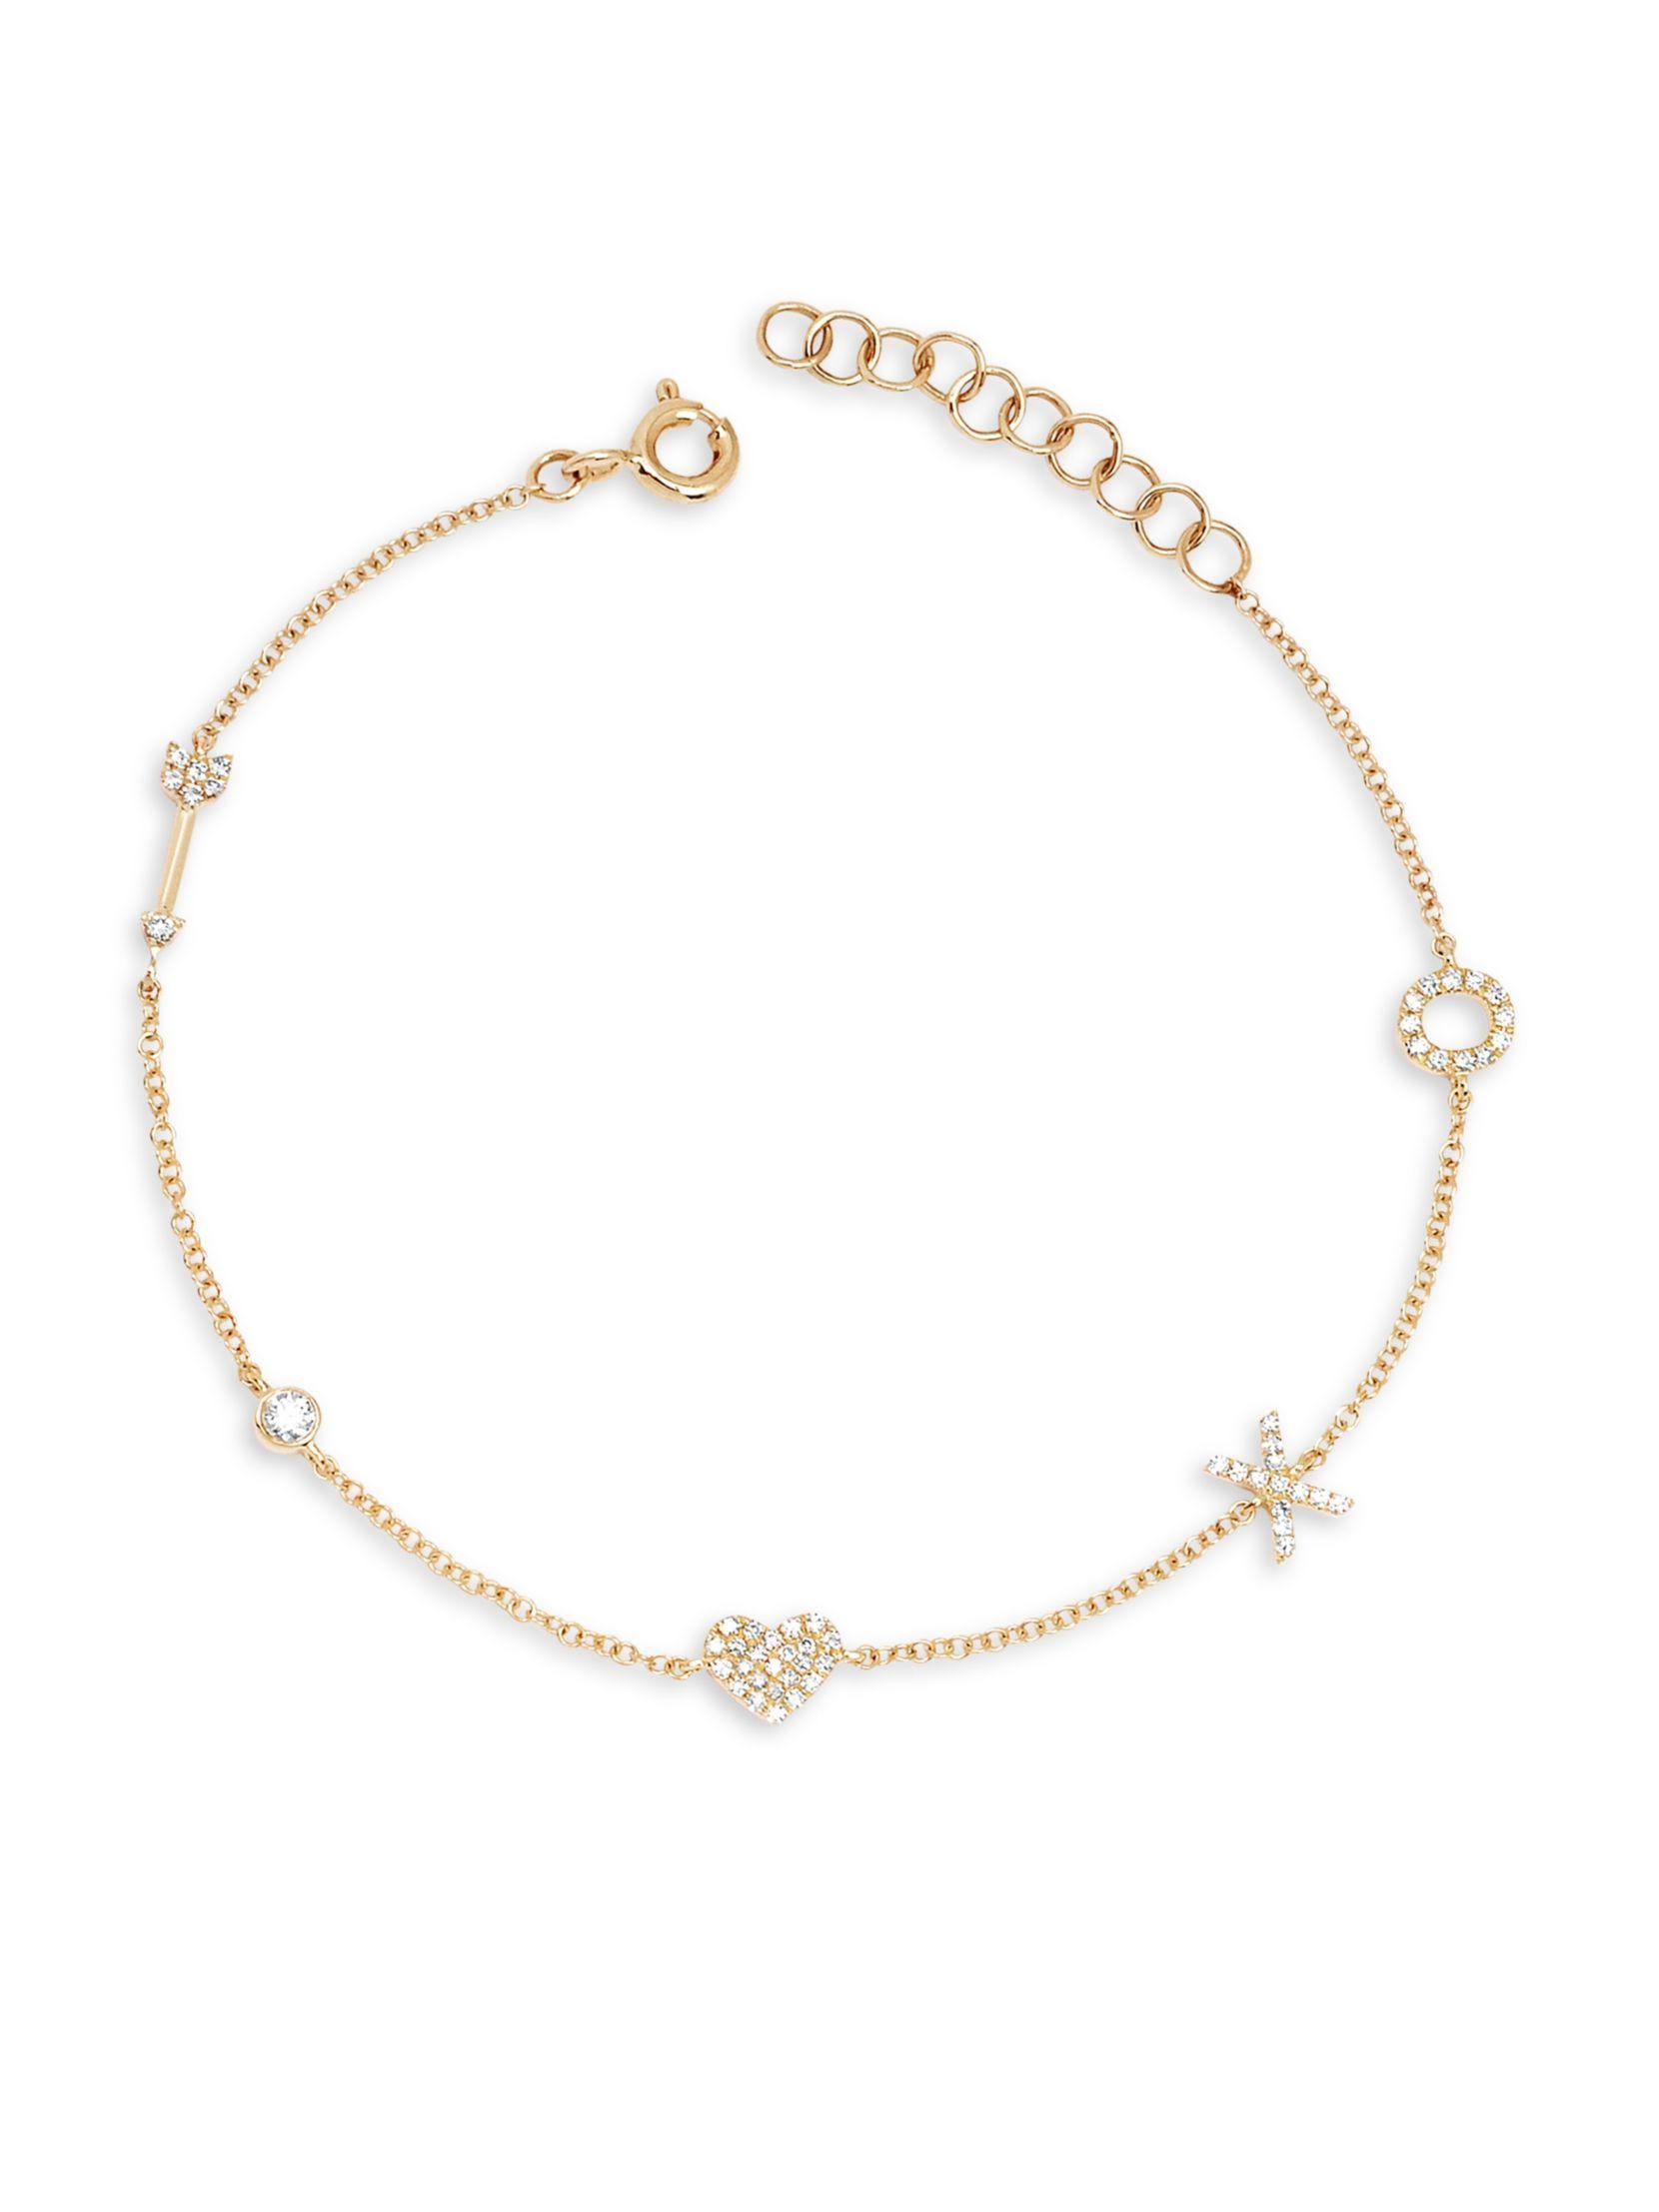 Ef collection k yellow gold u diamond sweetheart charm bracelet